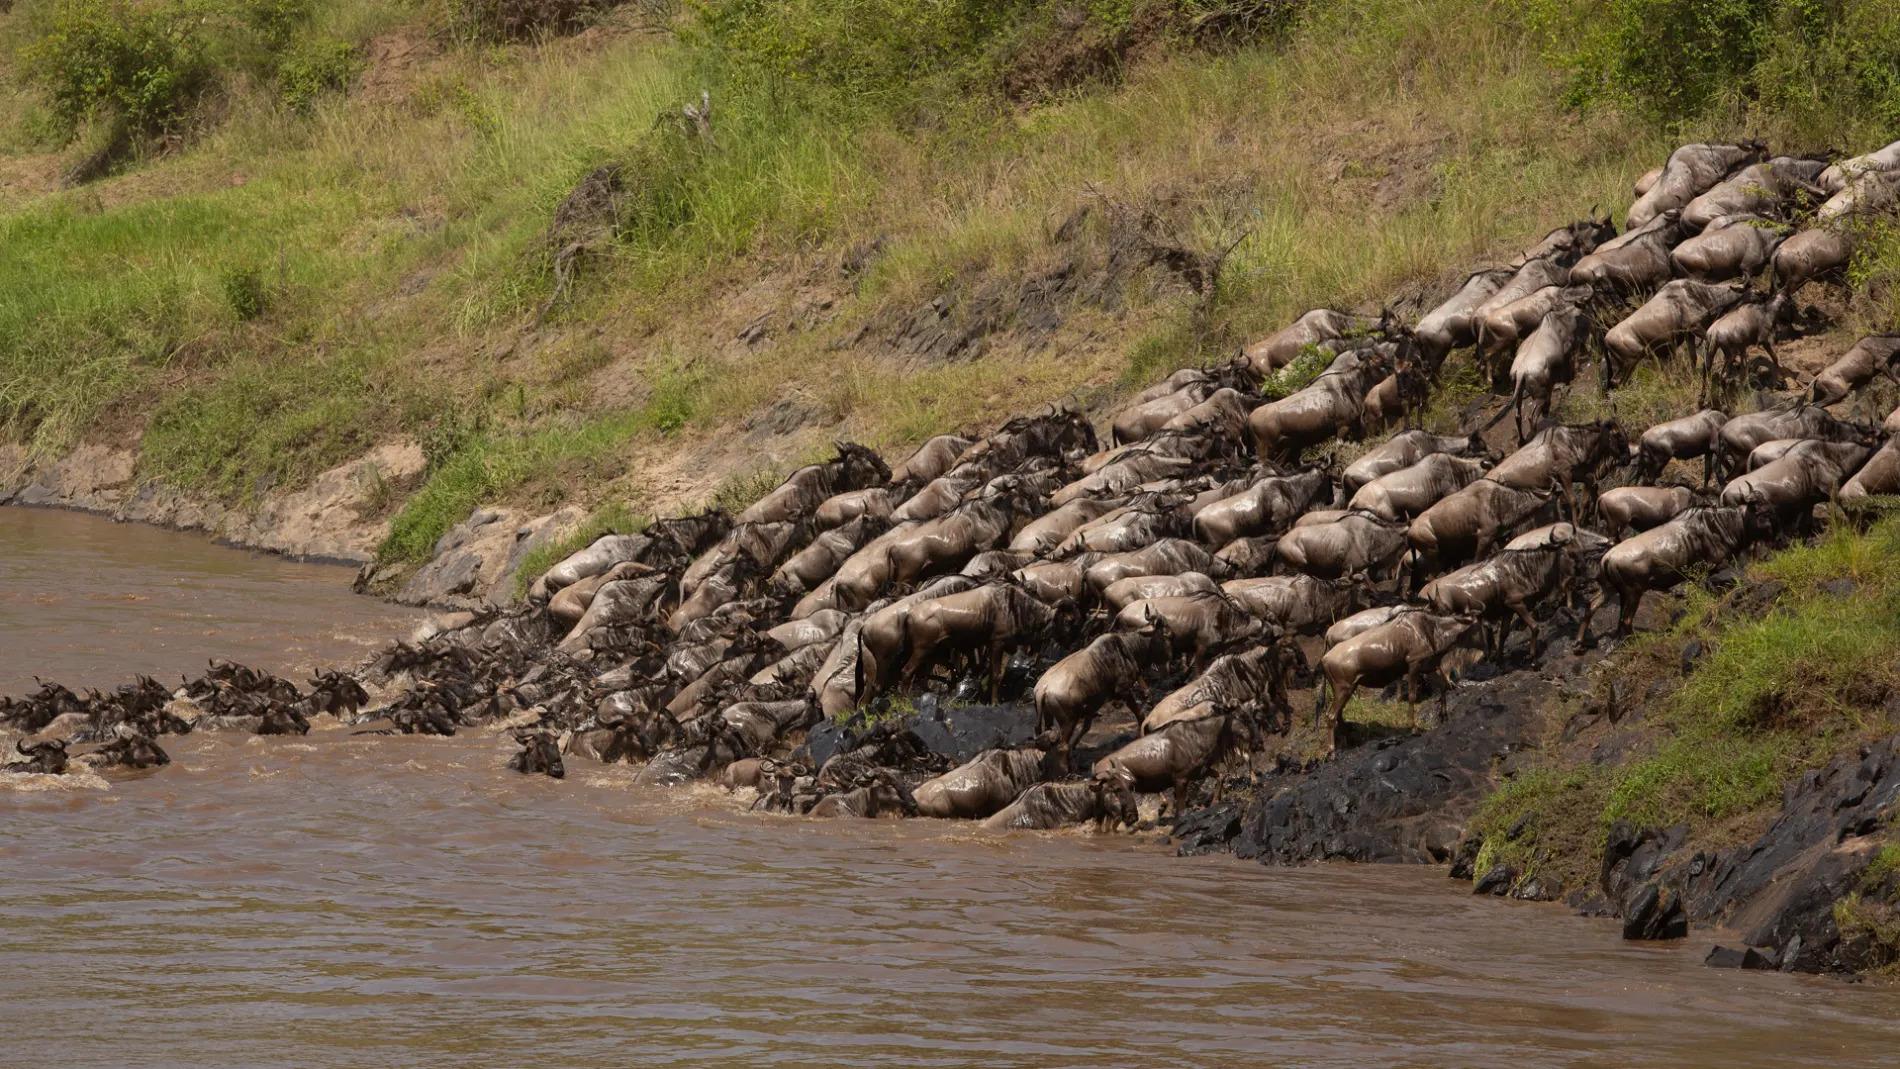 Wildebeest on river bank